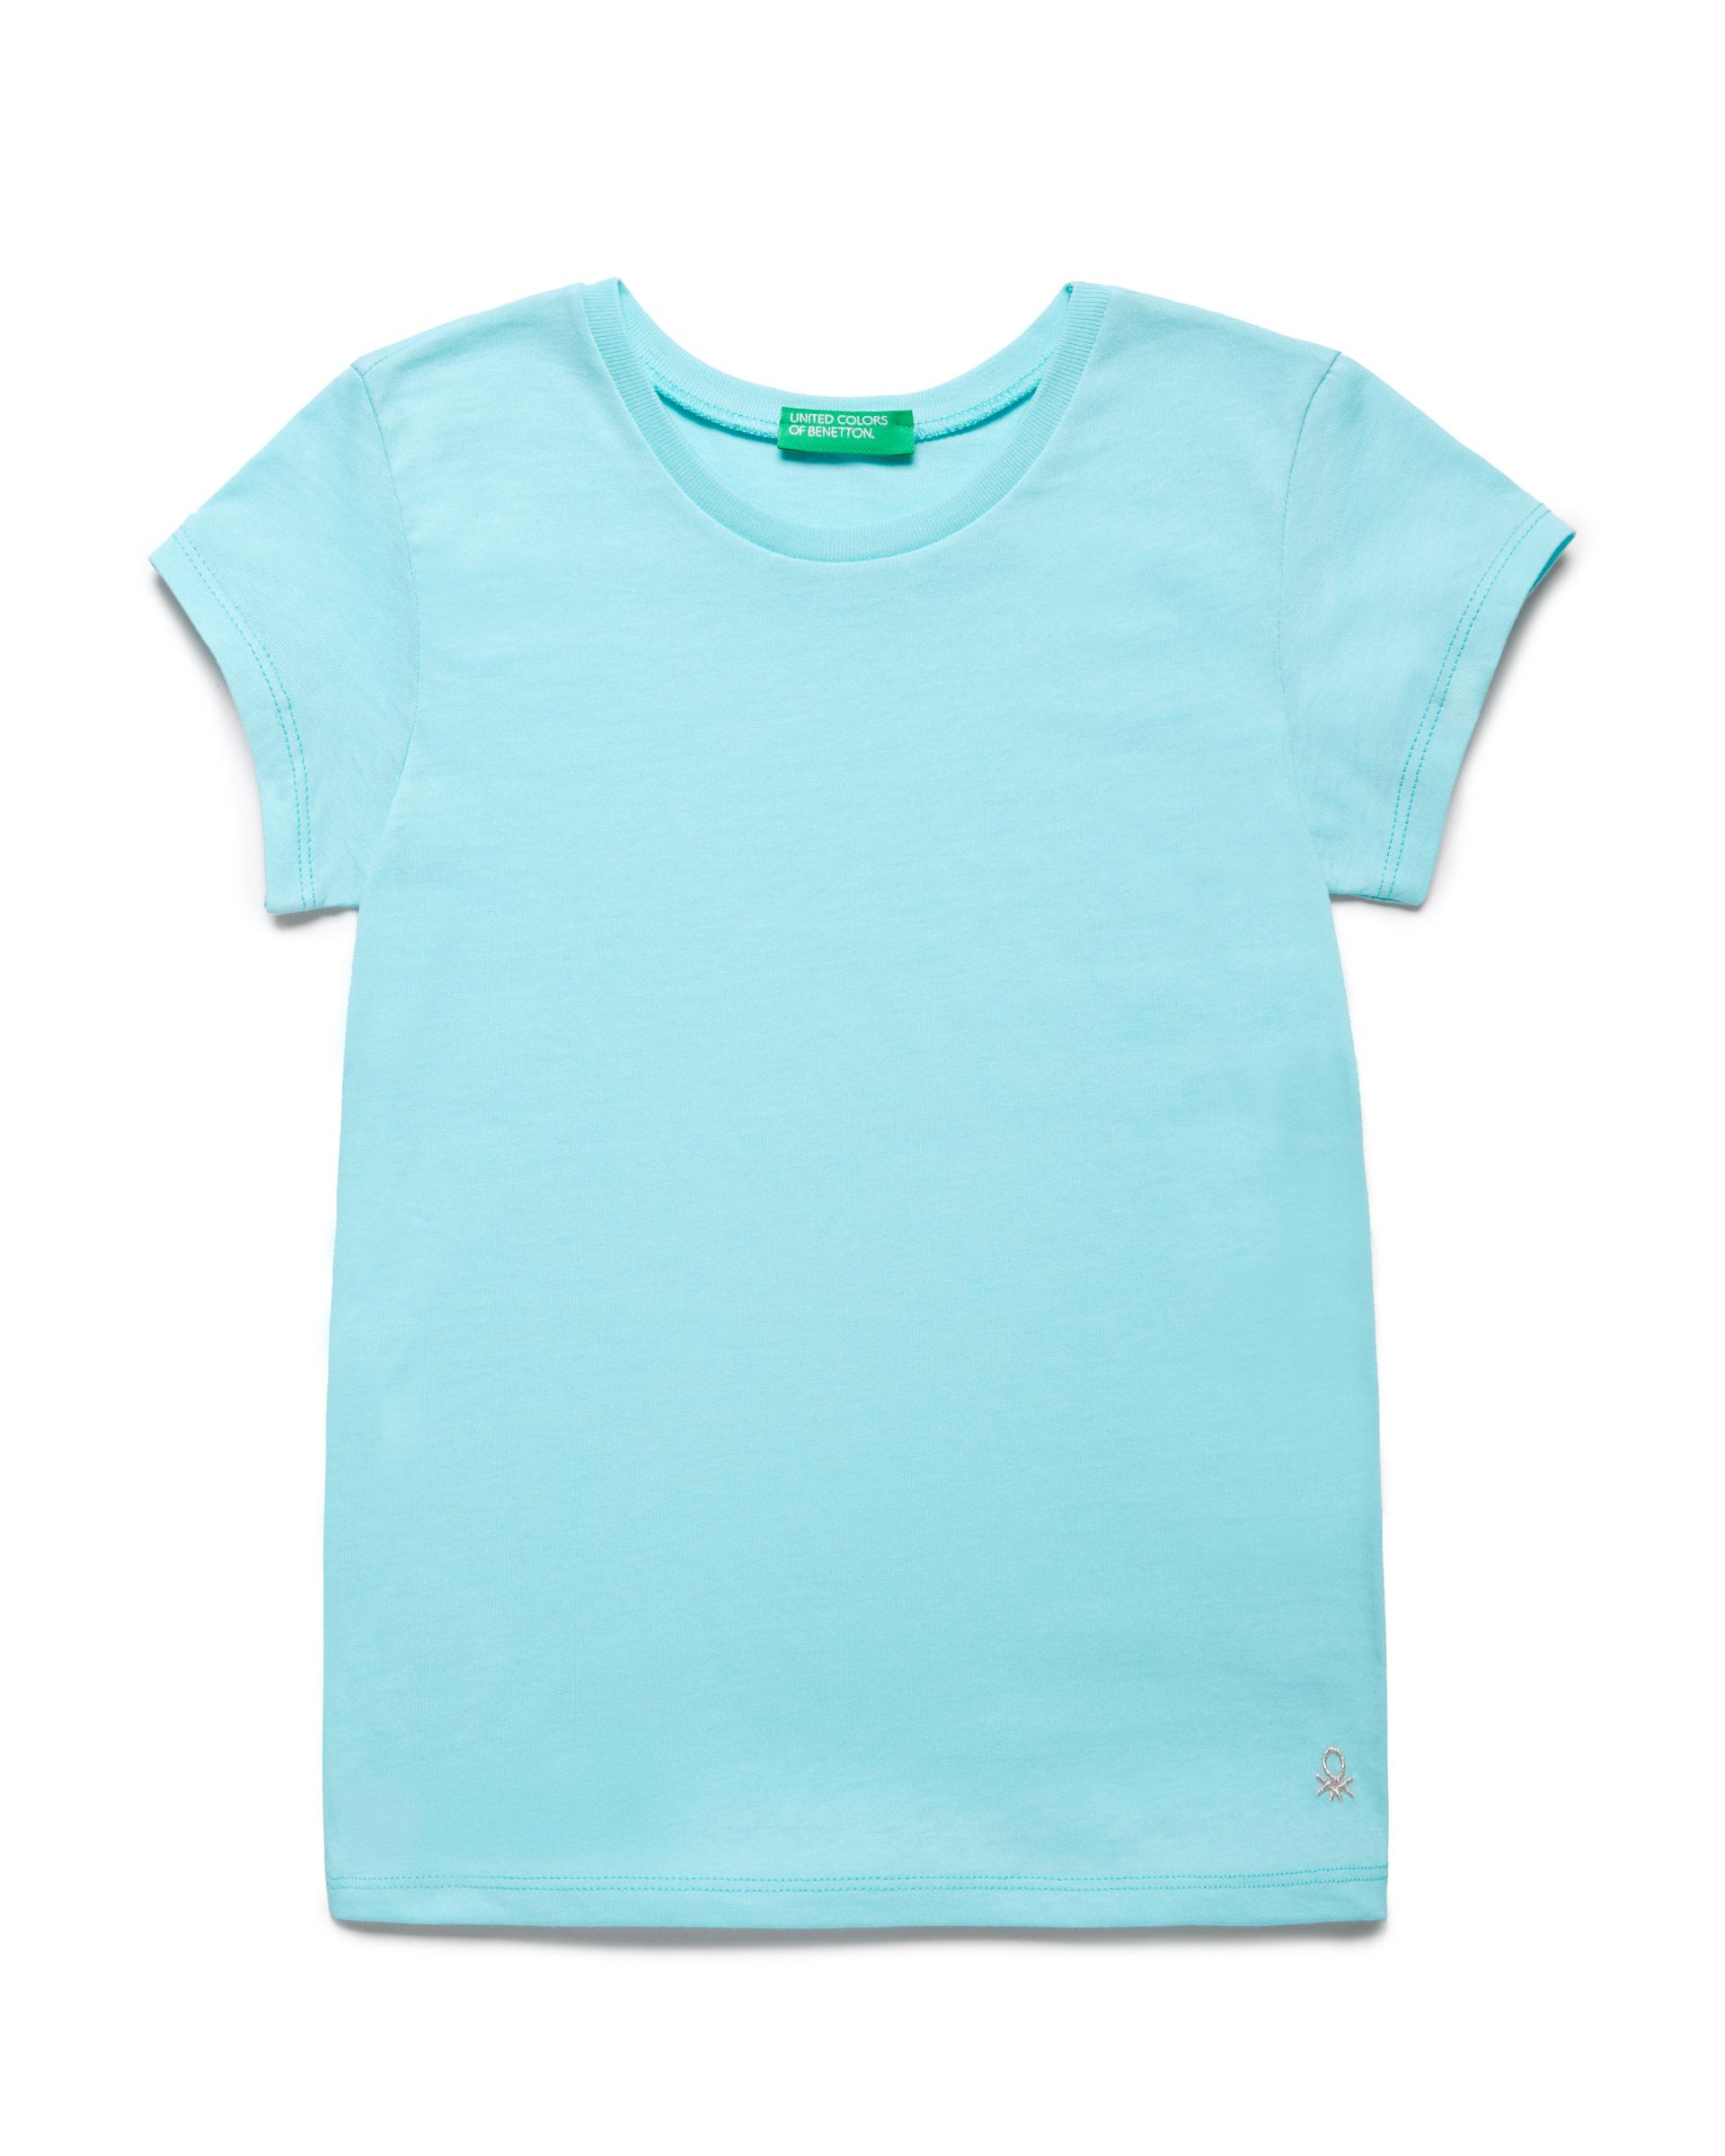 Купить 20P_3I1XC13J1_0Z8, Футболка для девочек Benetton 3I1XC13J1_0Z8 р-р 80, United Colors of Benetton, Кофточки, футболки для новорожденных